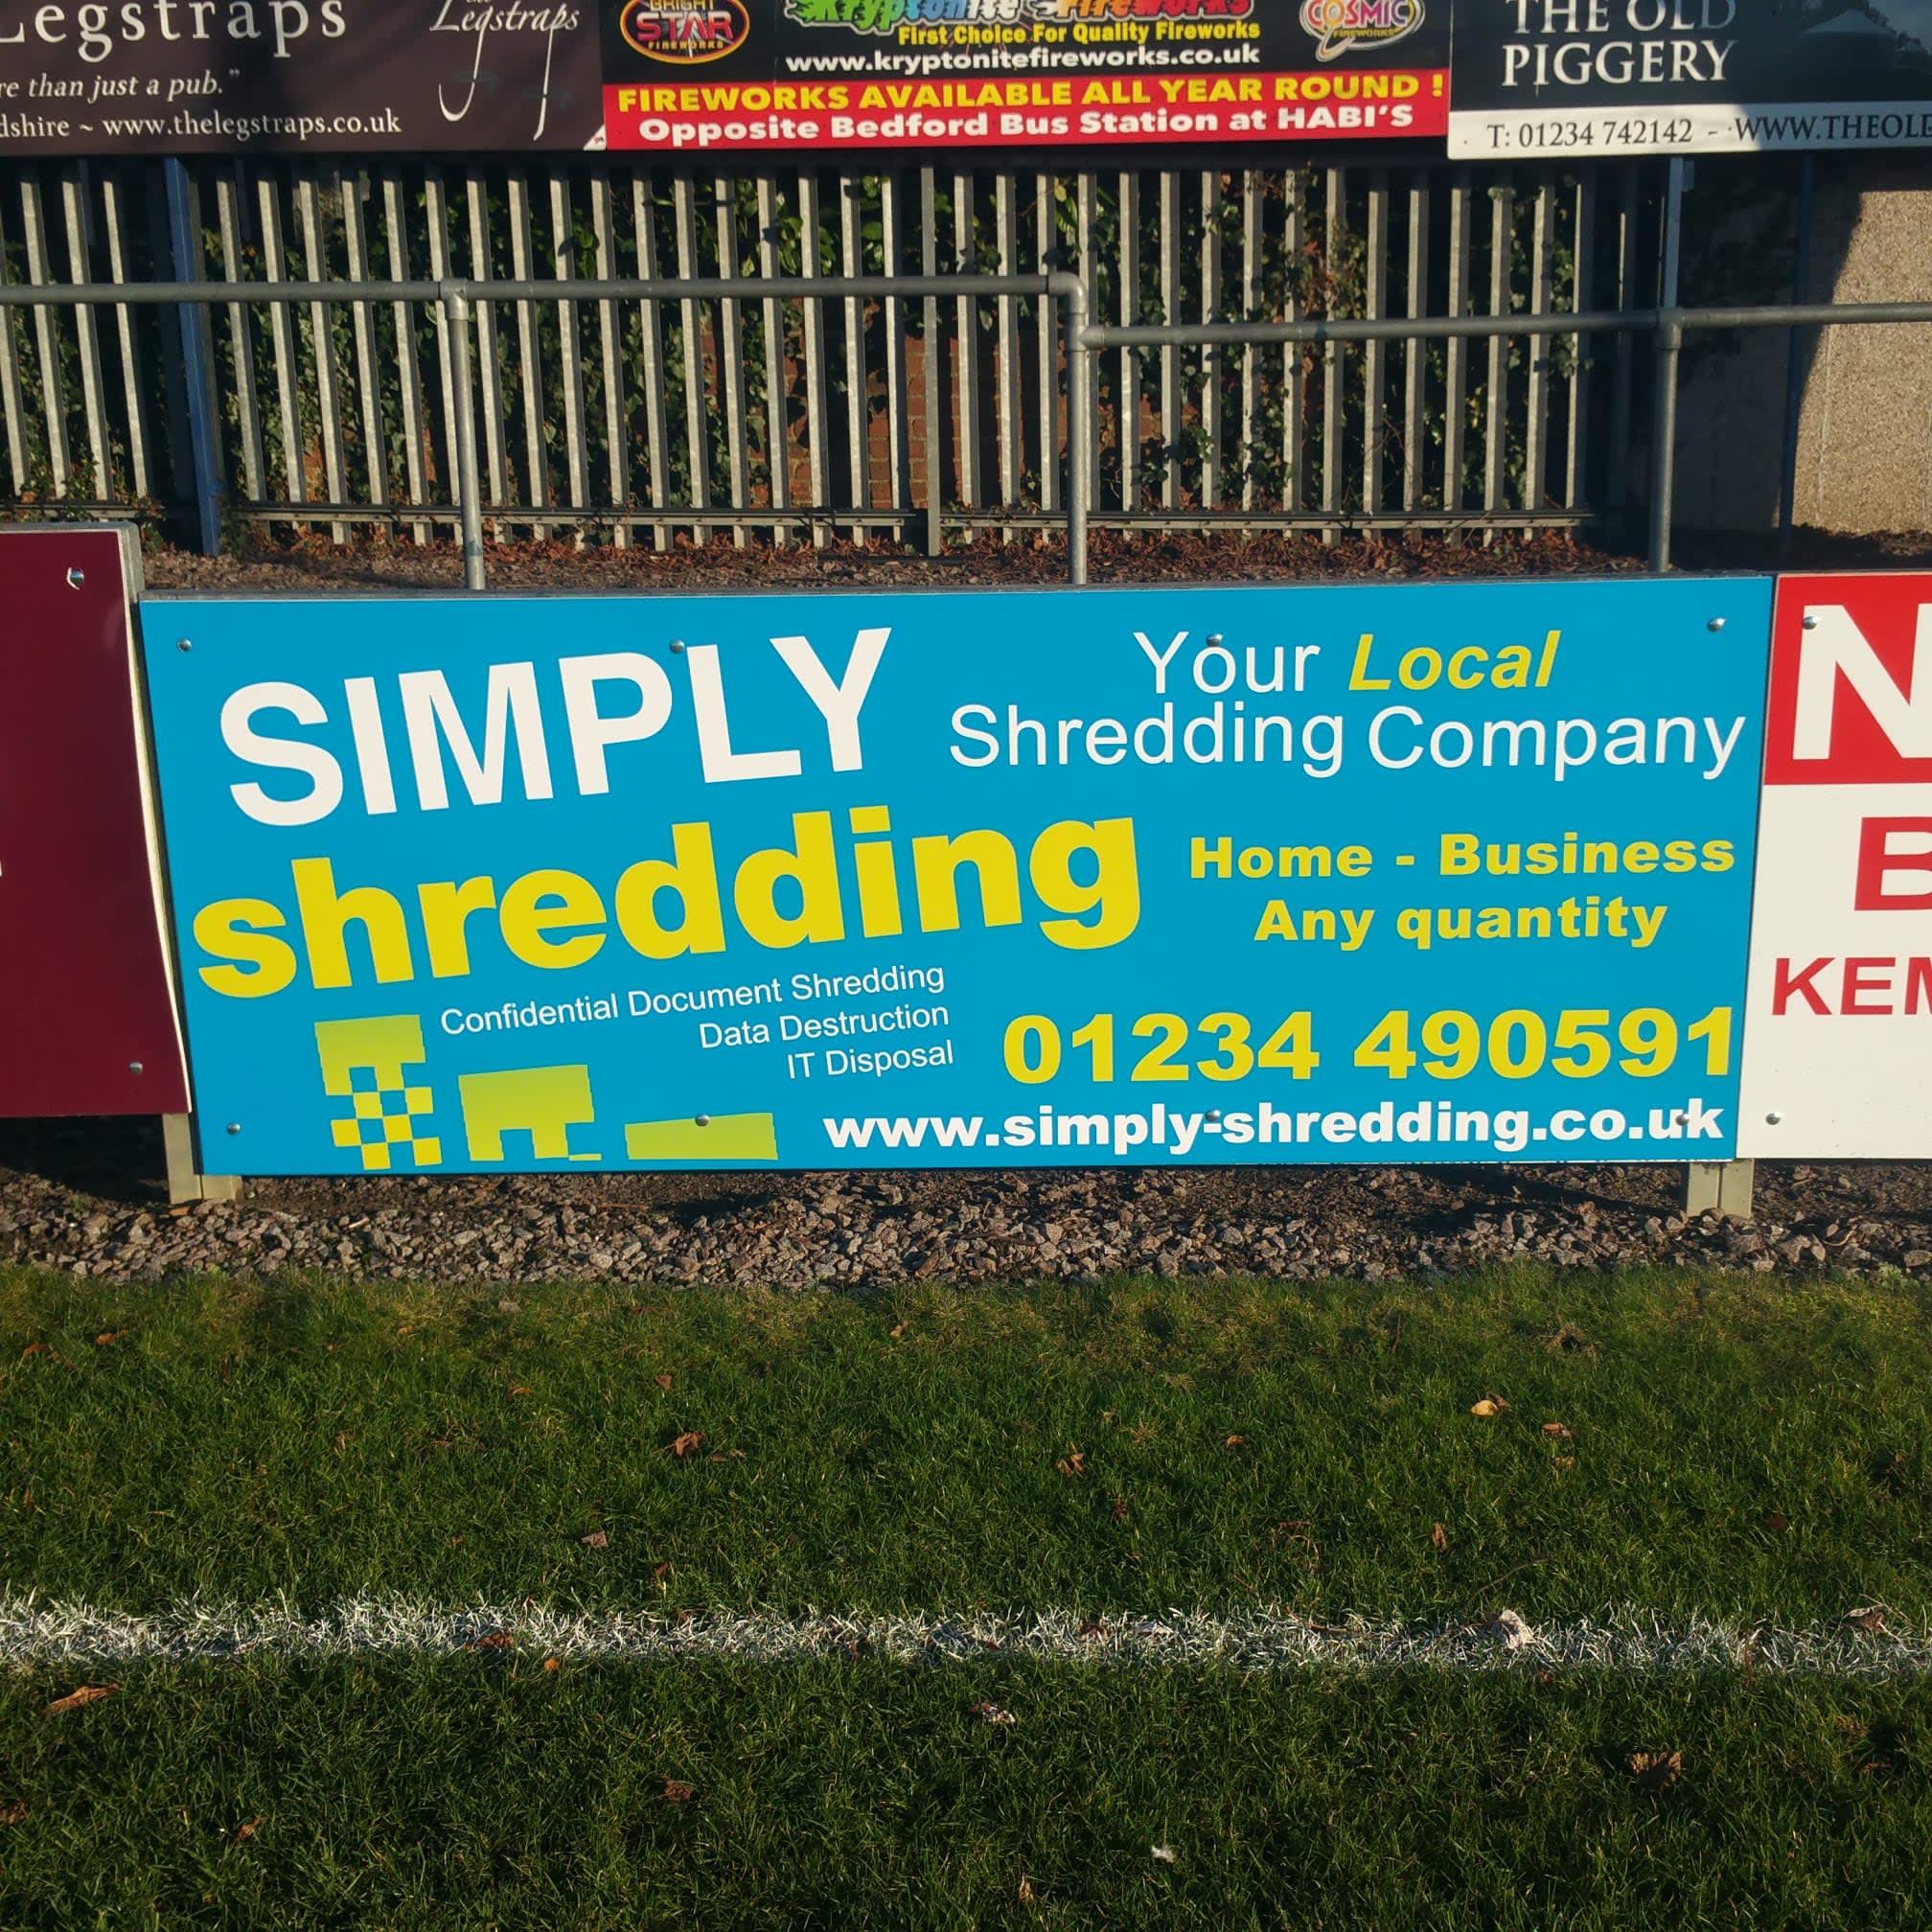 Simply Shredding (MK) Ltd - Bedford, Bedfordshire  - 01234 490591 | ShowMeLocal.com